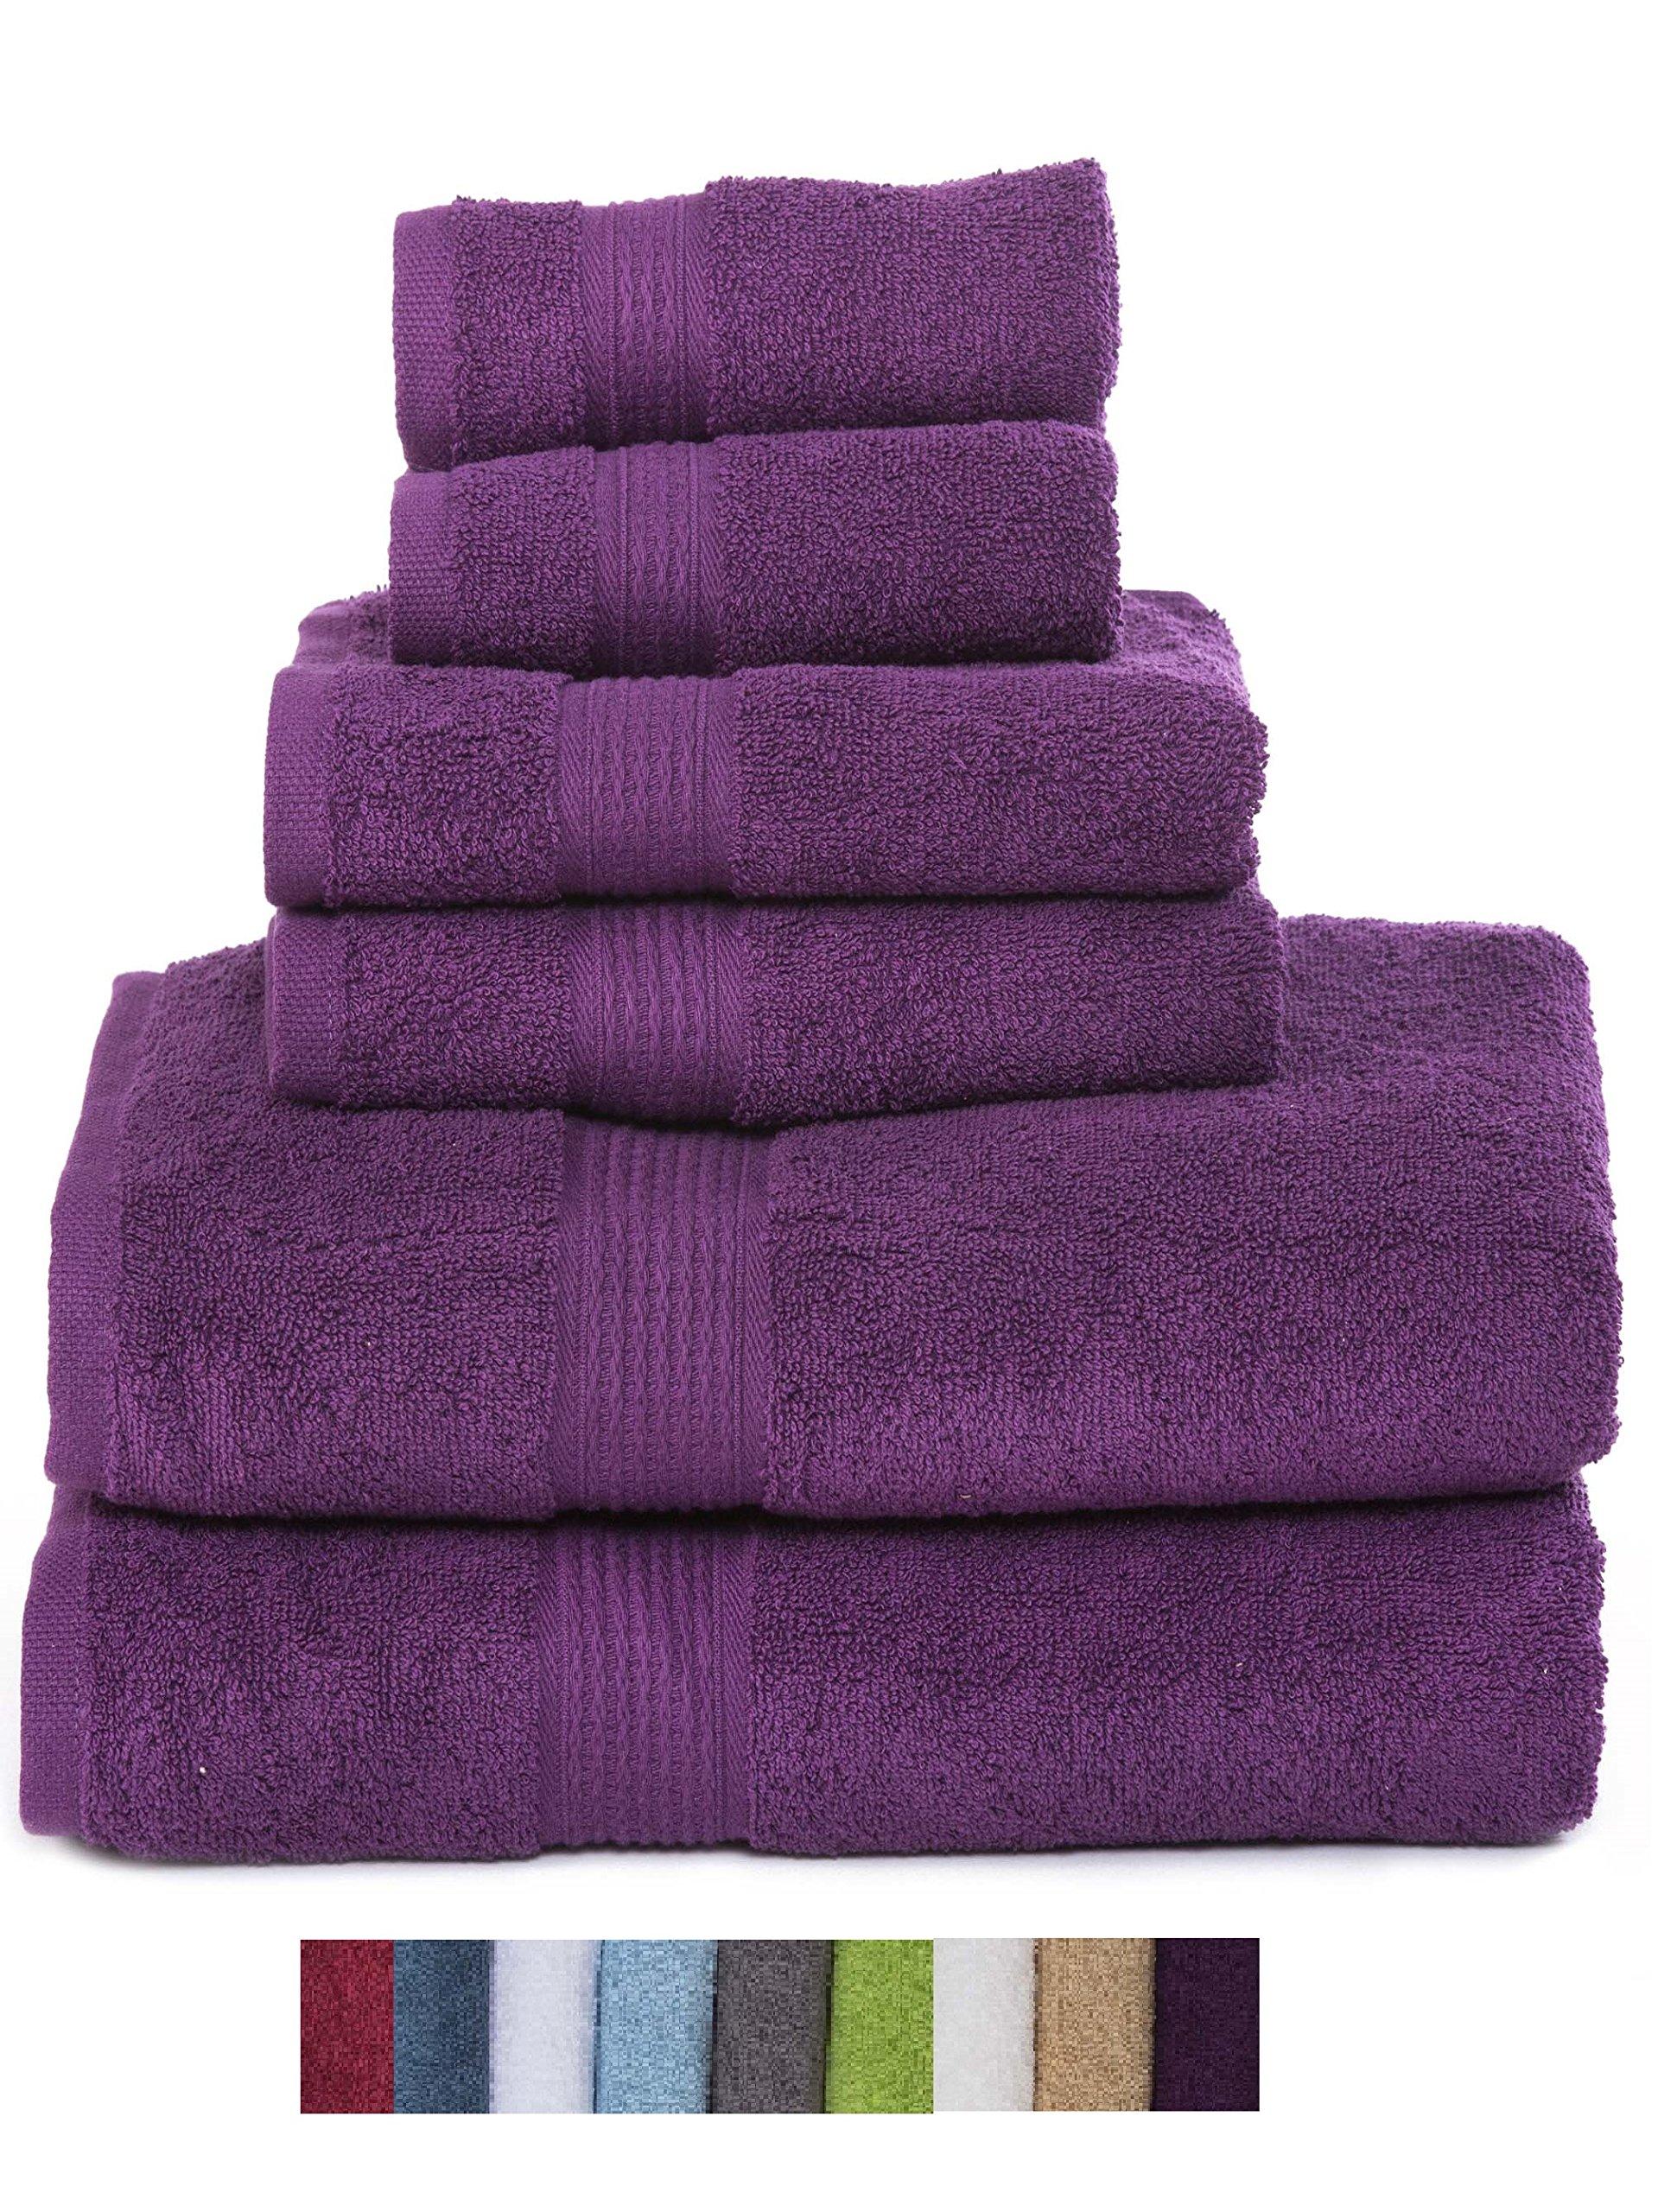 Hydro Basics Fade-Resistant 6-Piece Cotton Towel Set, 100% Cotton terry bathroom set, Soft, Absorbent, Machine Washable, Quick Dry (plum)